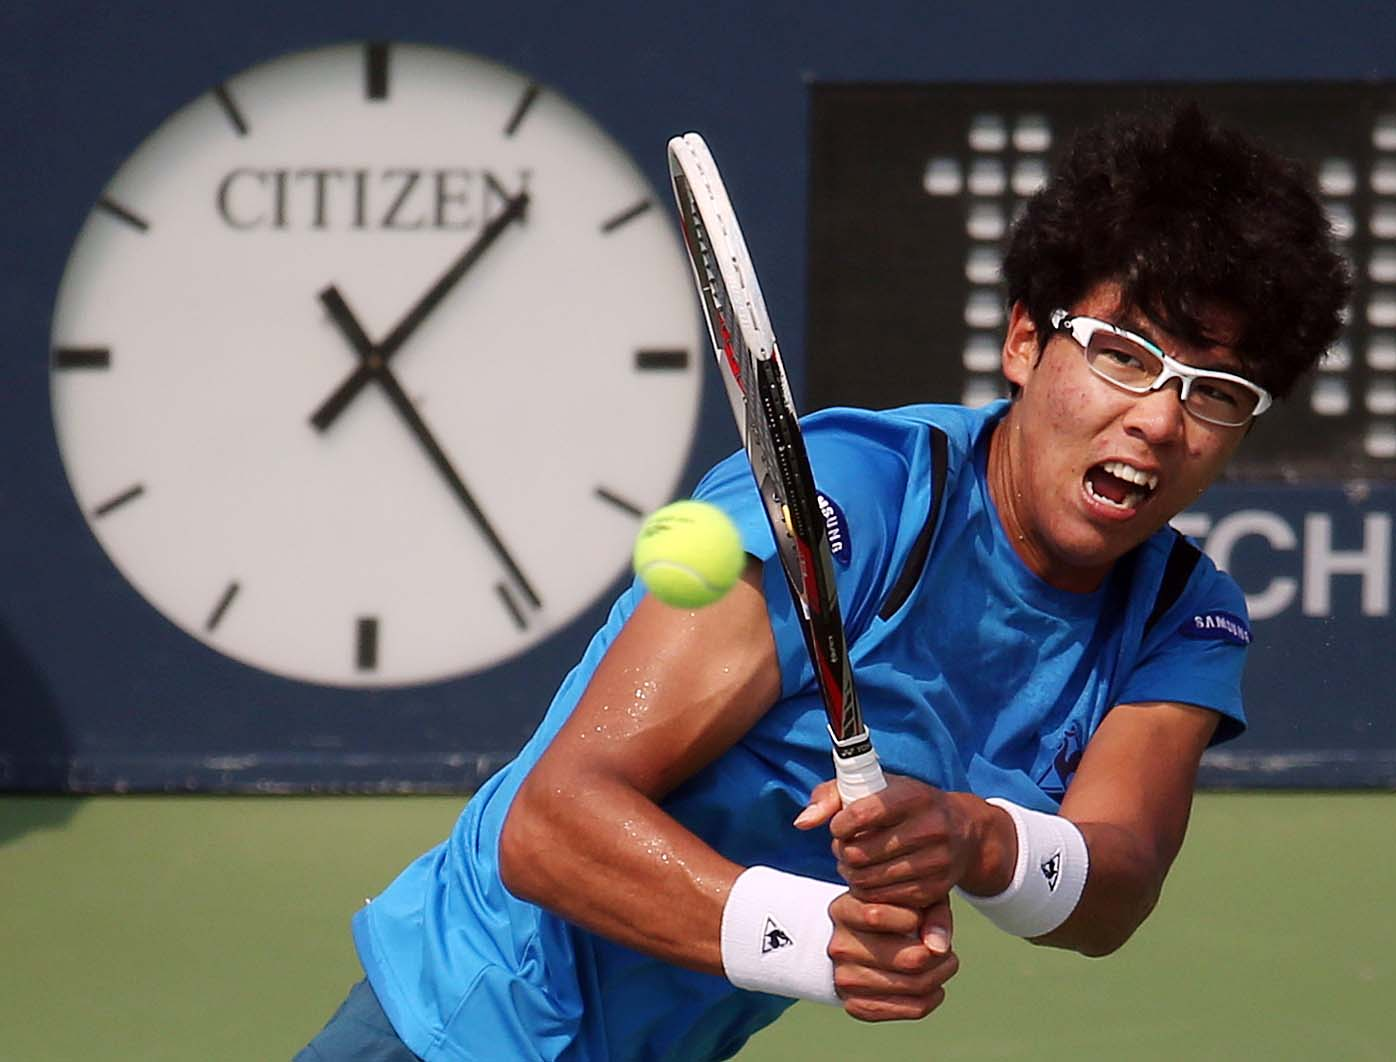 chung tennis